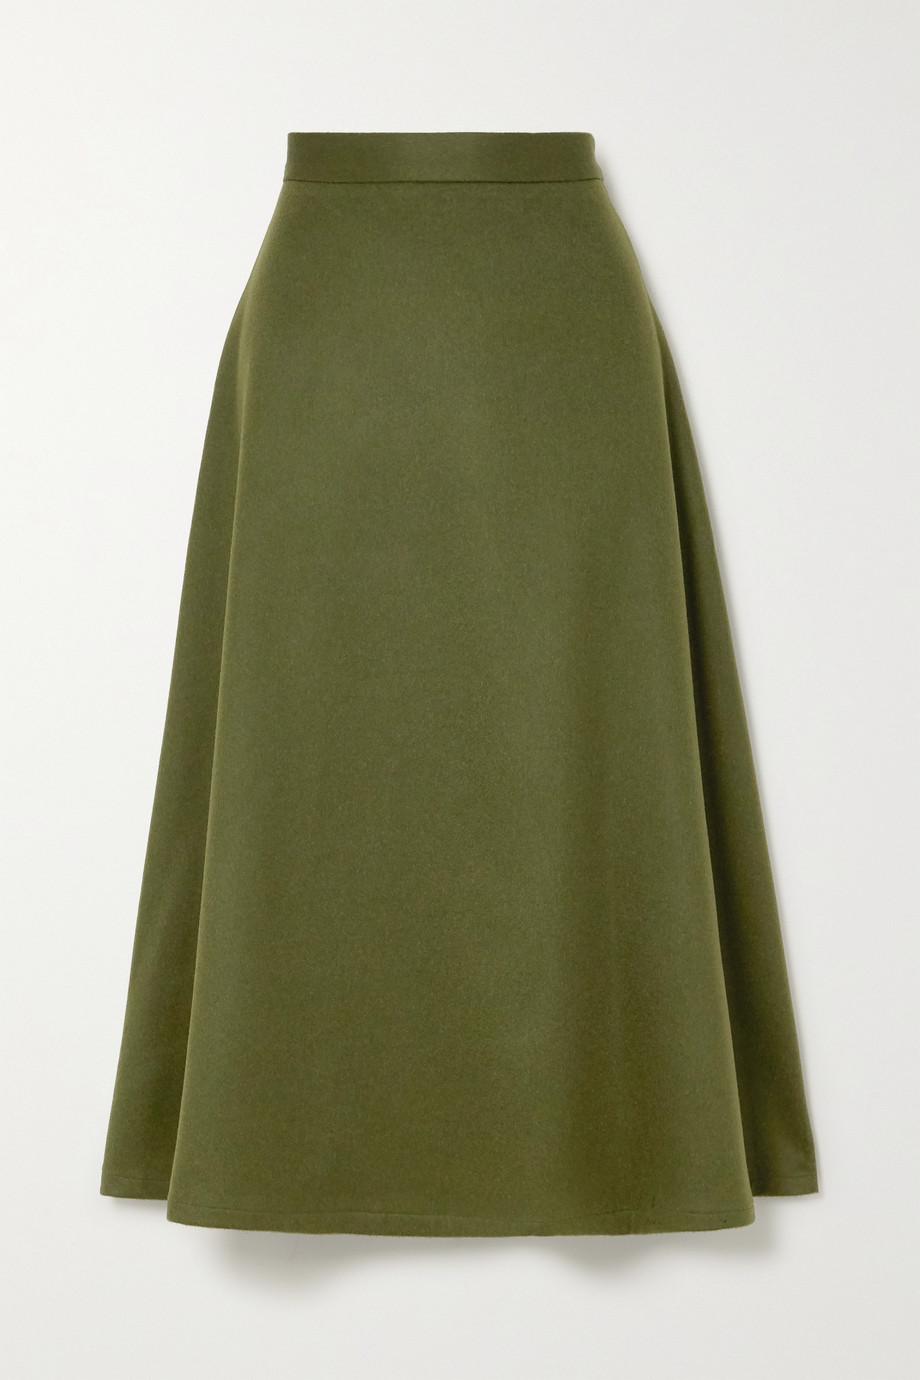 Giuliva Heritage The Ada herringbone camel hair midi skirt